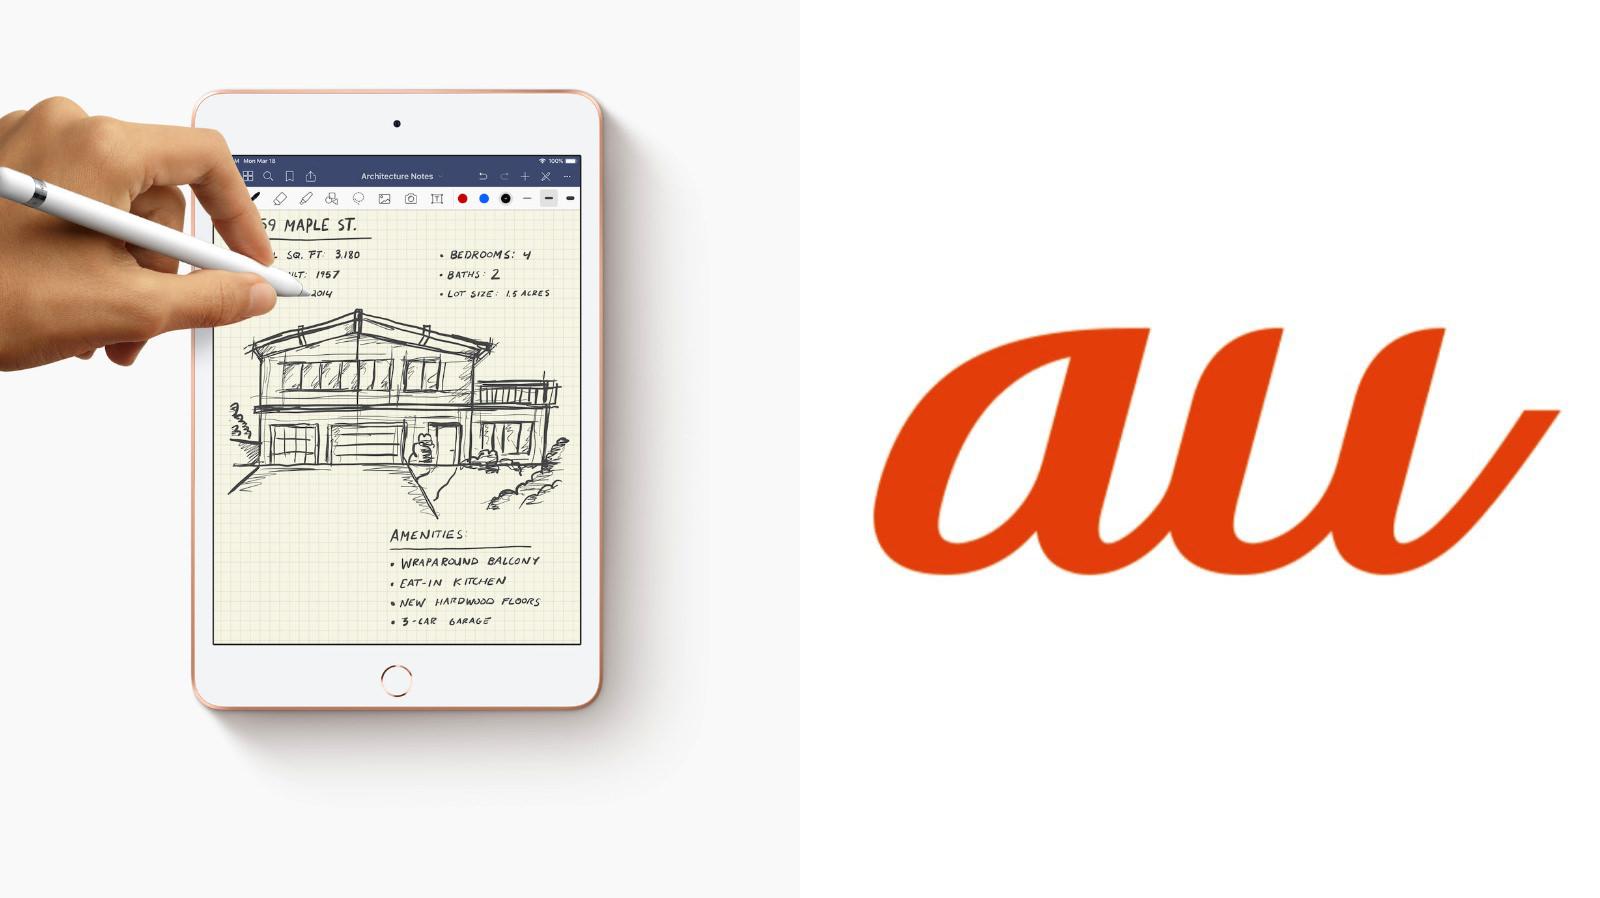 au-Pricing-for-ipad-air-and-mini.jpg